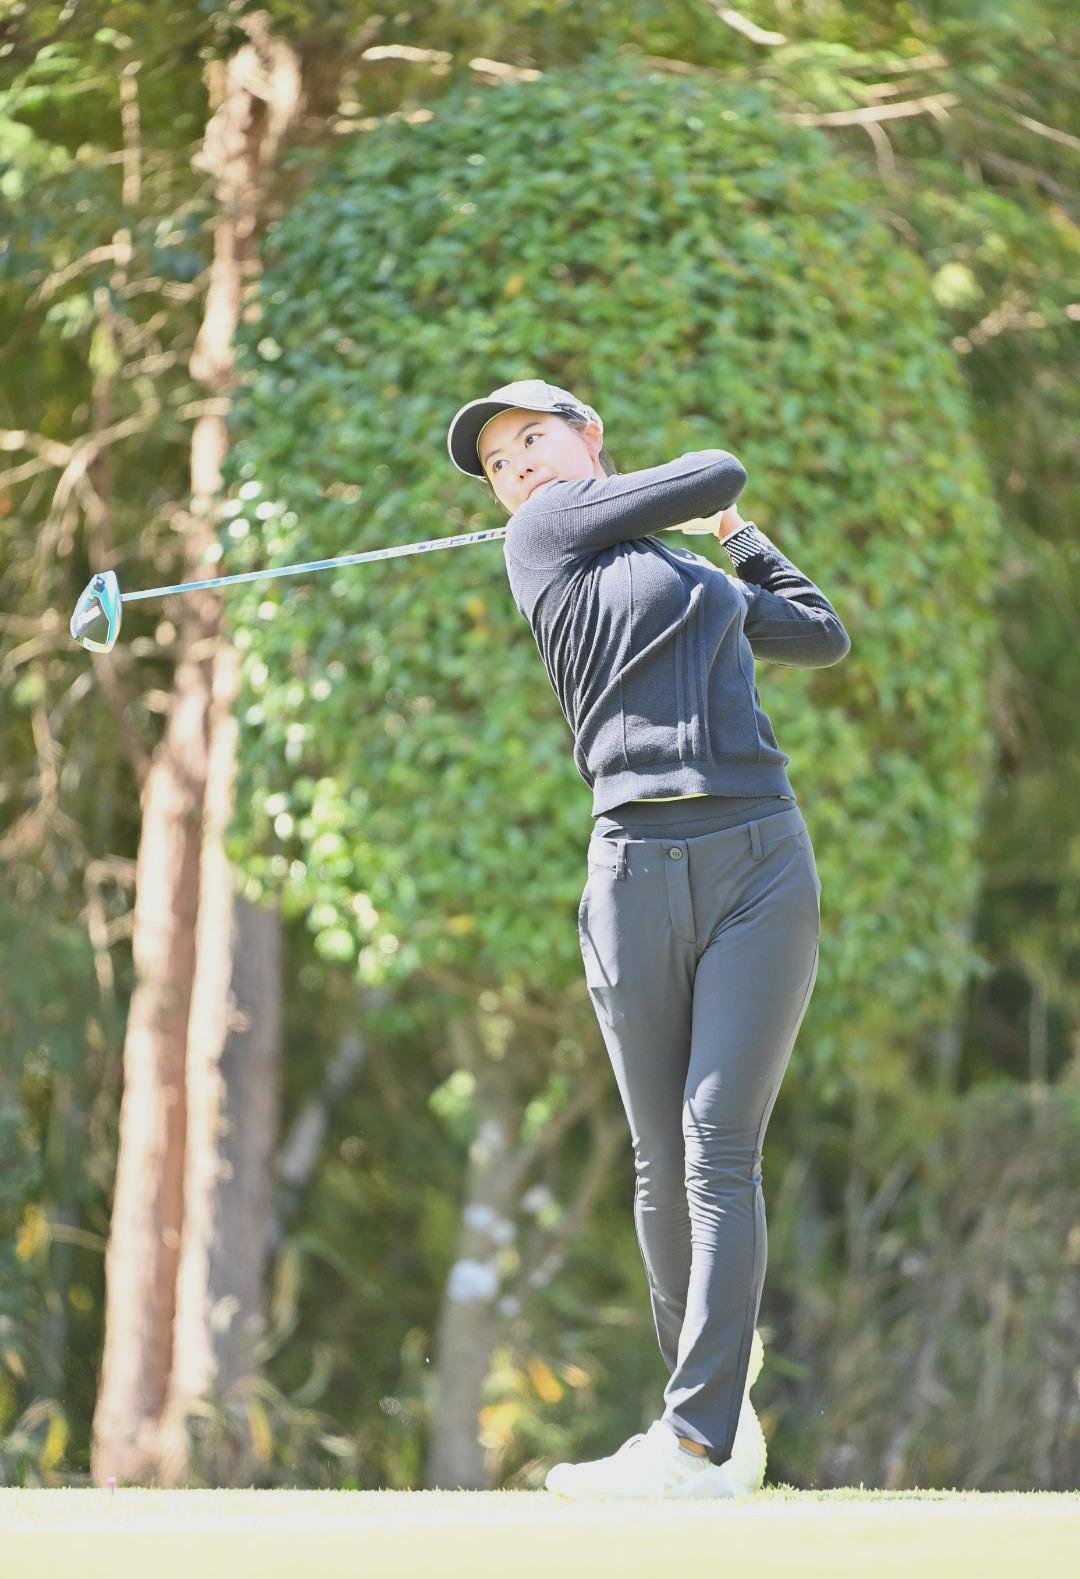 https://www.nikkansports.com/sports/golf/news/img/202104100000125-w1300_19.jpg